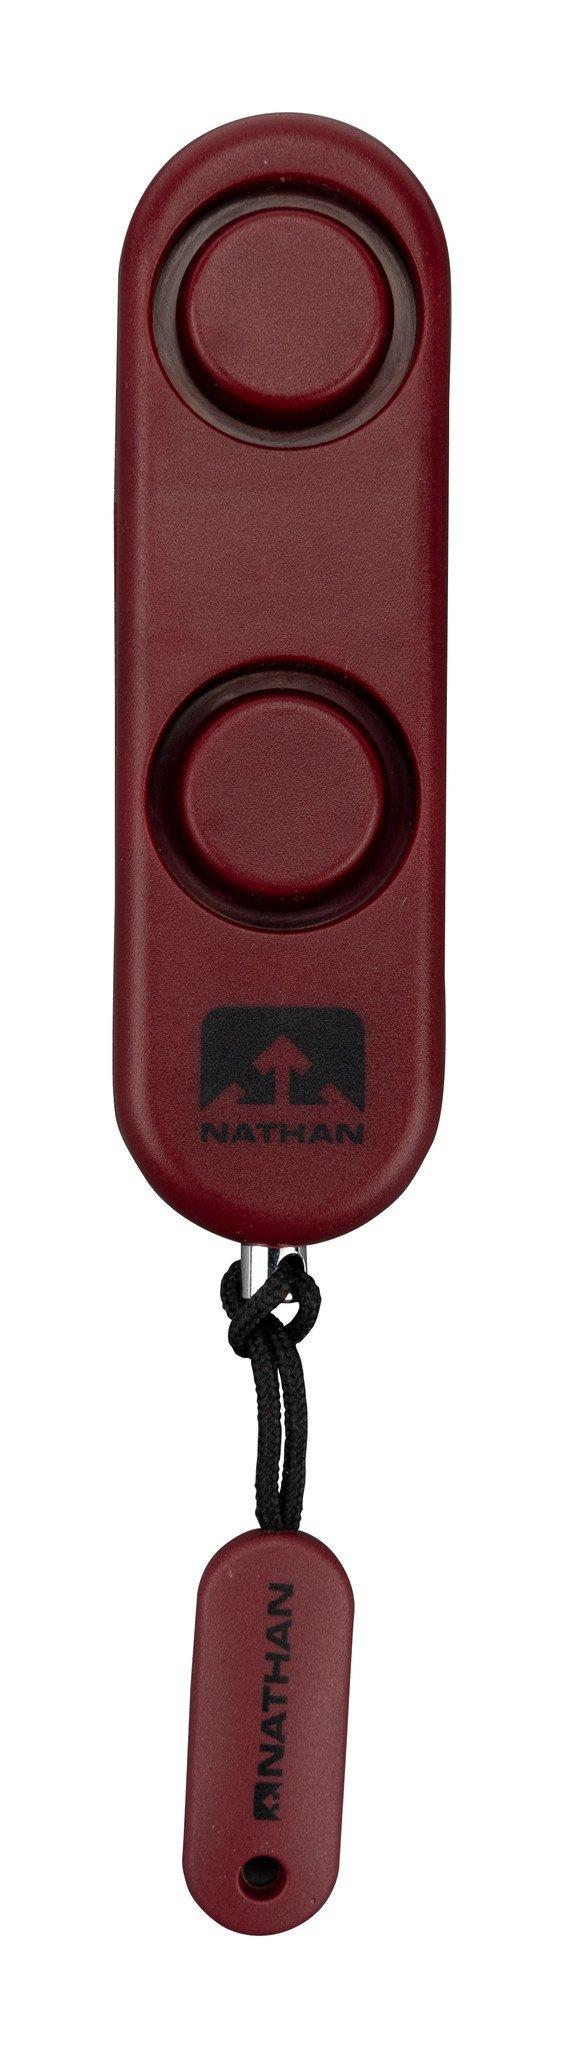 Nathan SaferRun Ripcord Siren Personal Alarm